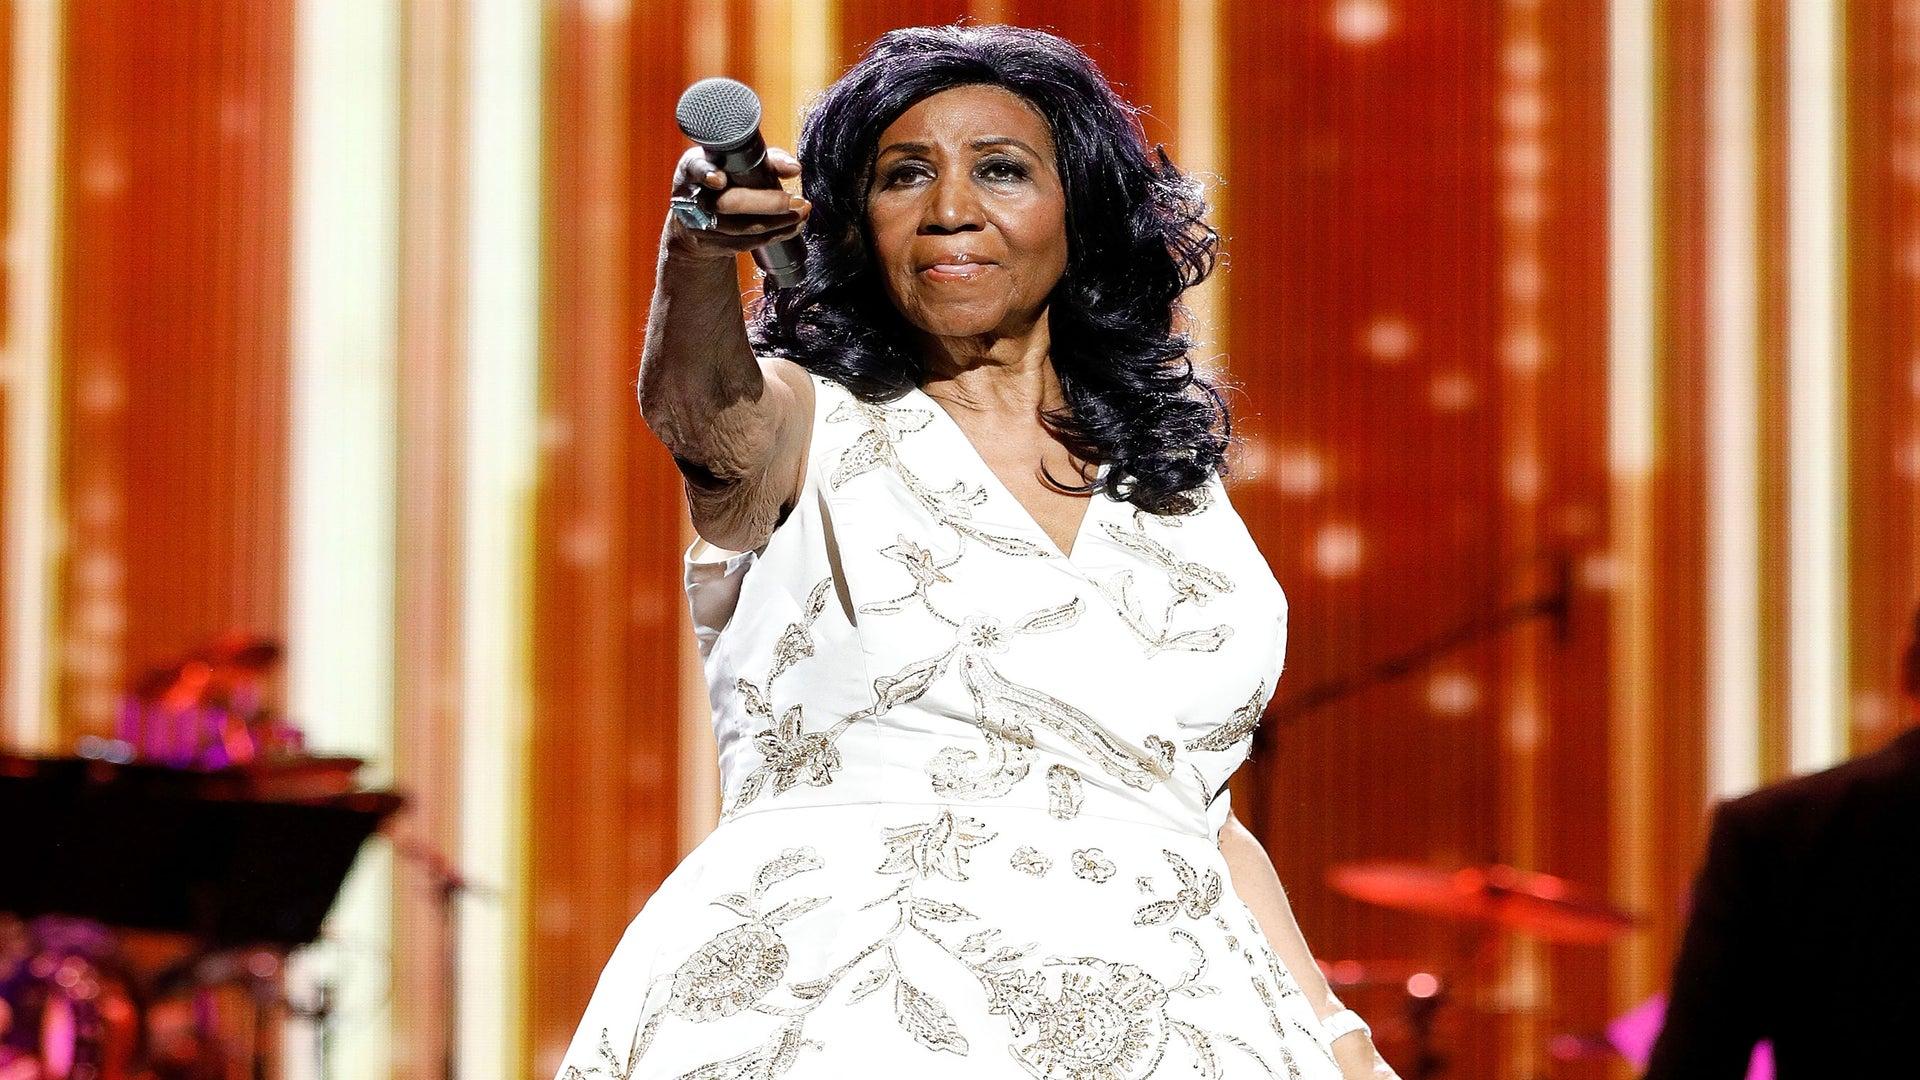 Aretha Franklin Cancels Concert 'Per Doctor's Orders'